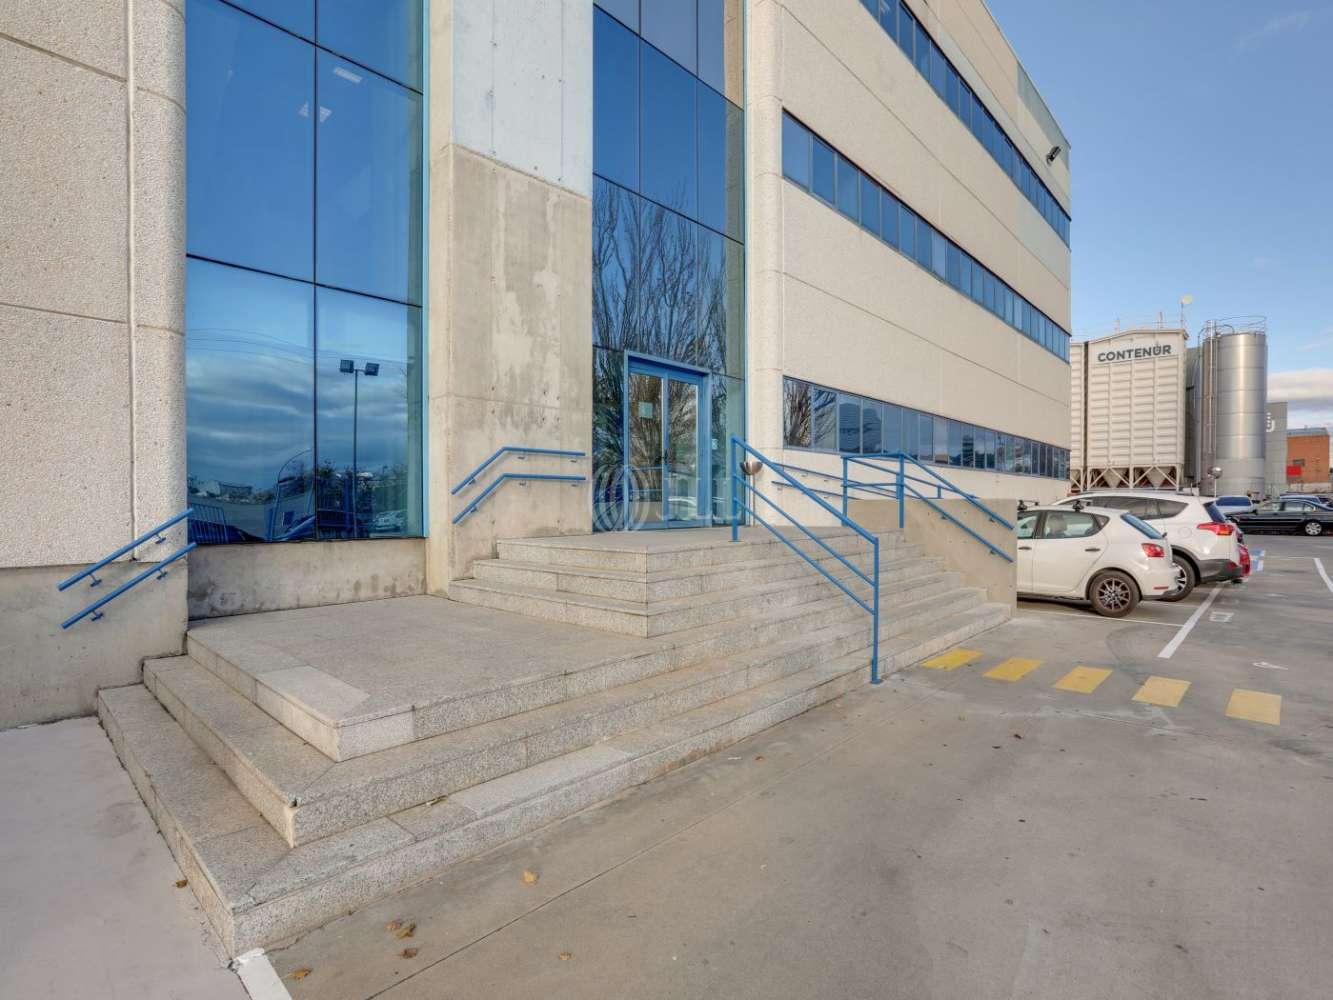 Naves industriales y logísticas Getafe, 28906 - Nave Logistica - M0392 NAVE LOGISTICA ALQUILER P.I SAN MARCOS GETAFE P3